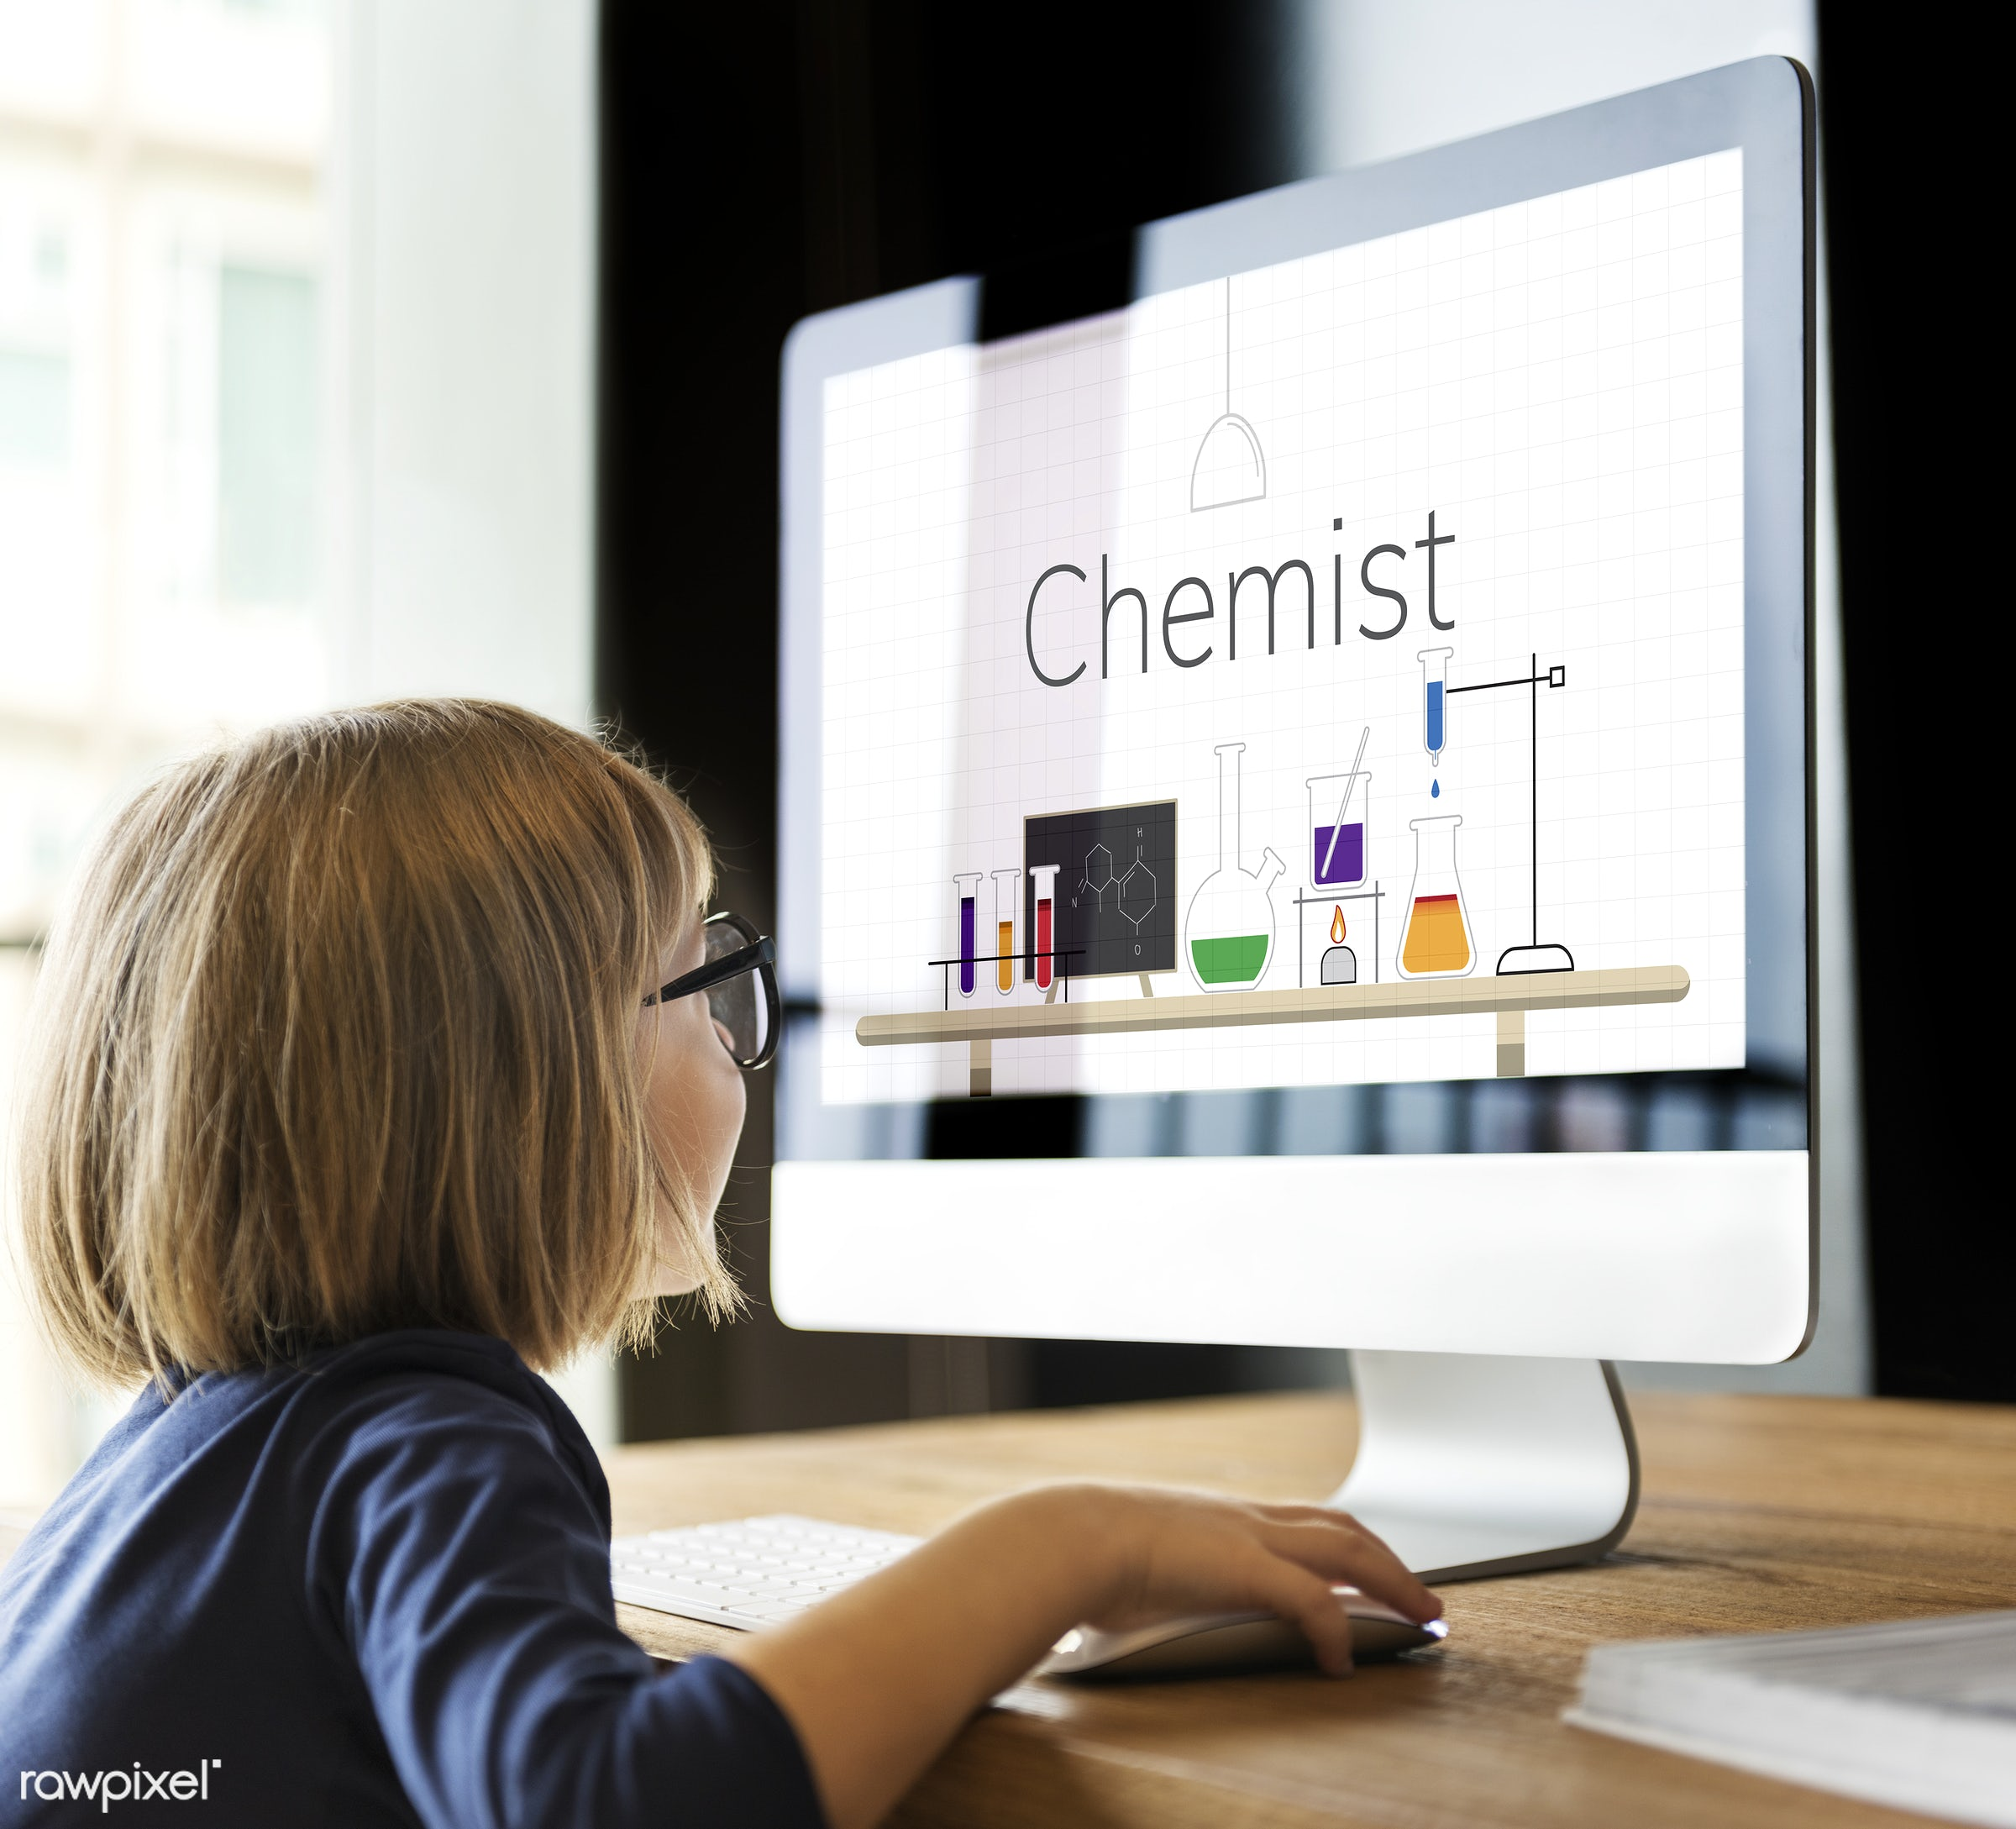 browsing, caucasian, chem, chemical, chemist, chemistry, child, childhood, computer, cute, device, digital, education, exam...